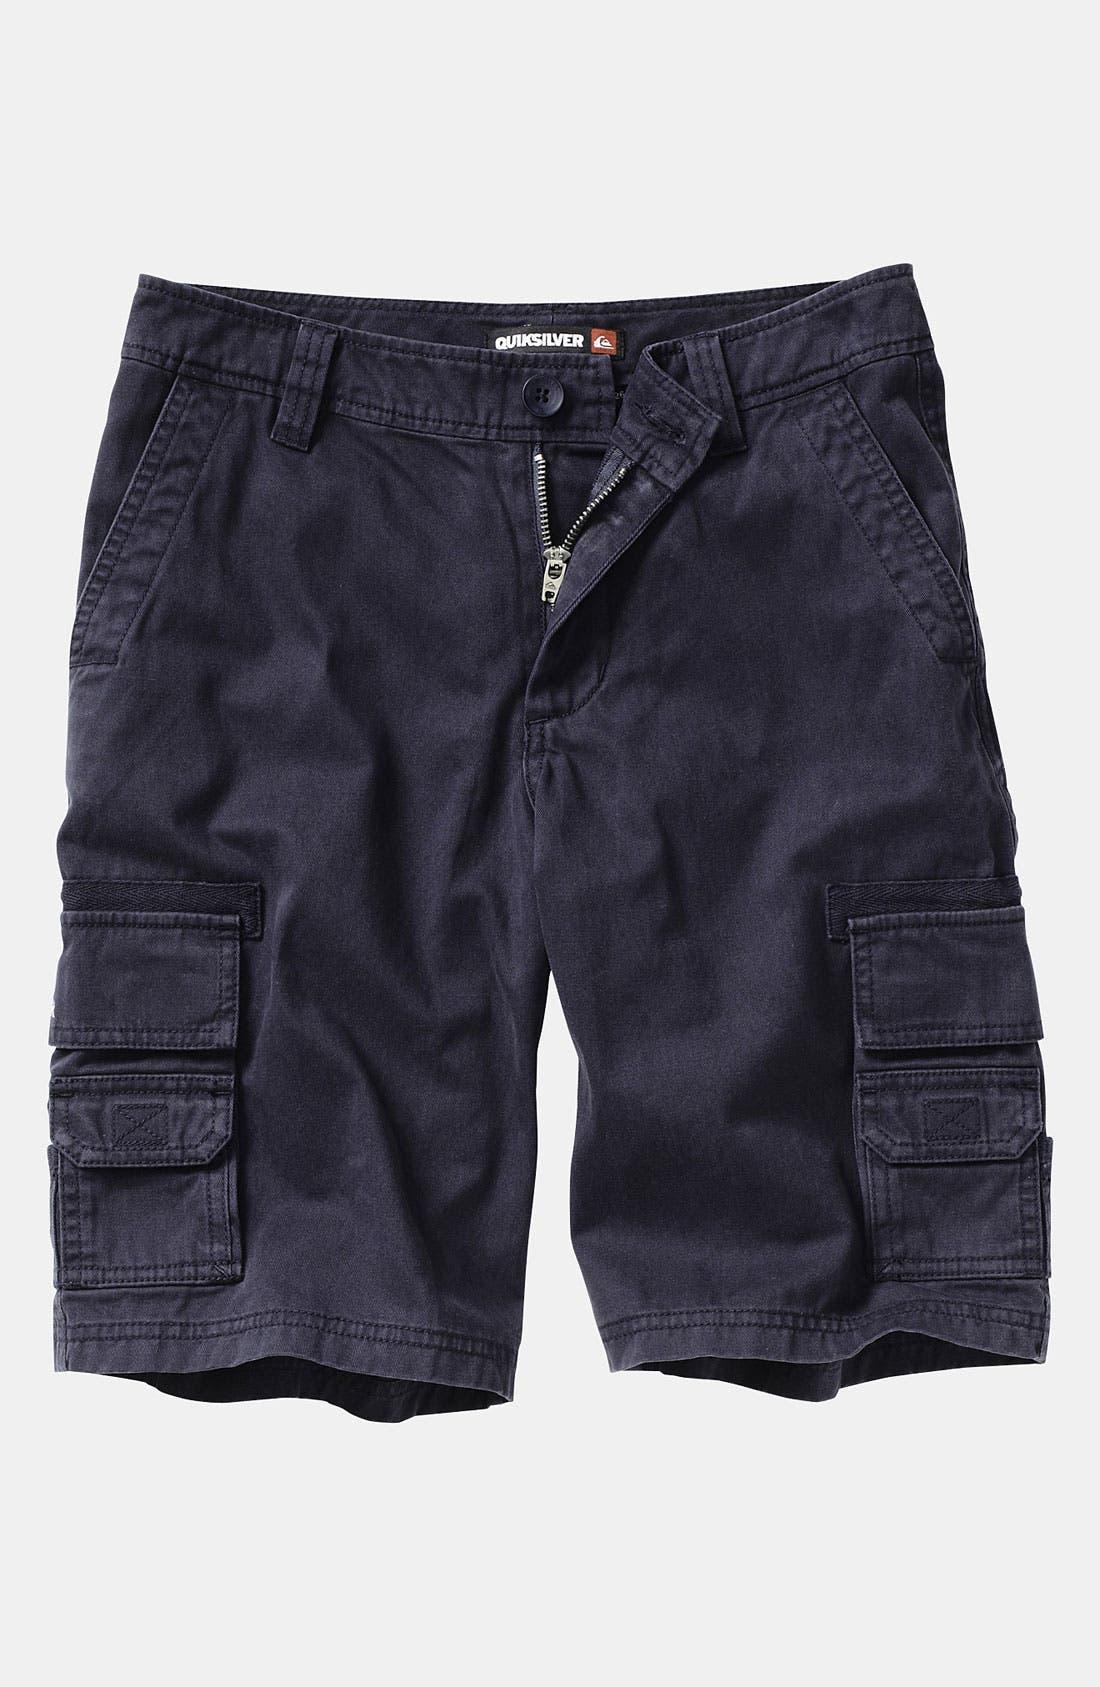 Alternate Image 1 Selected - Quiksilver 'Escargot' Cargo Shorts (Infant)